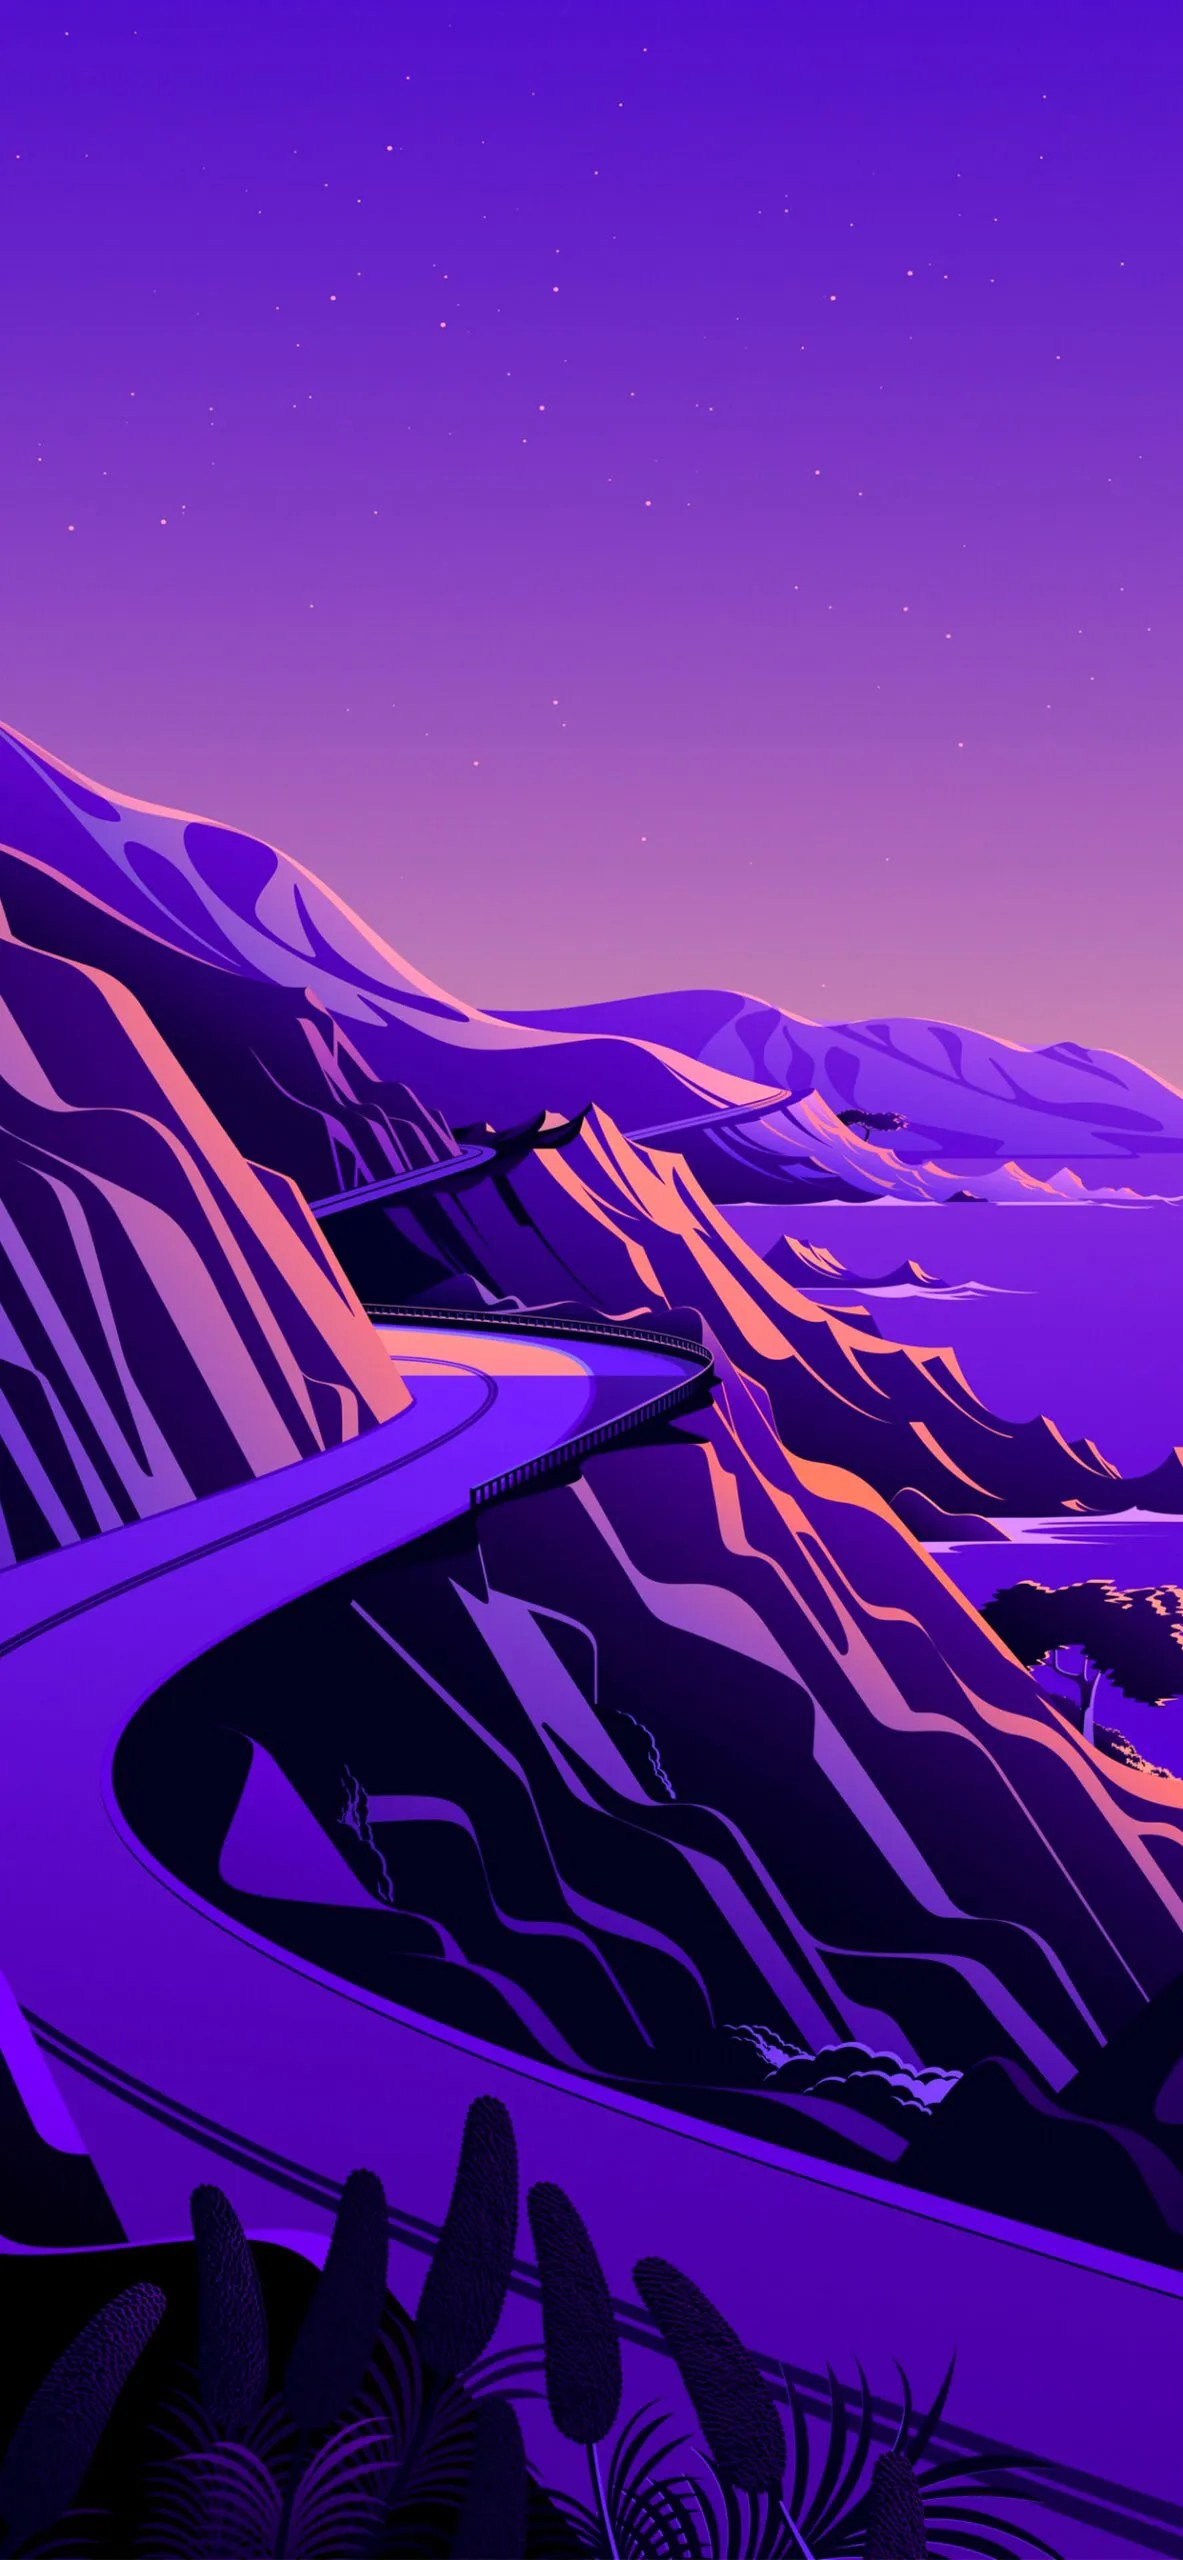 iphone wallpaper big sur cliffs6 scaled Mac OS Big Sur (Cliffs)